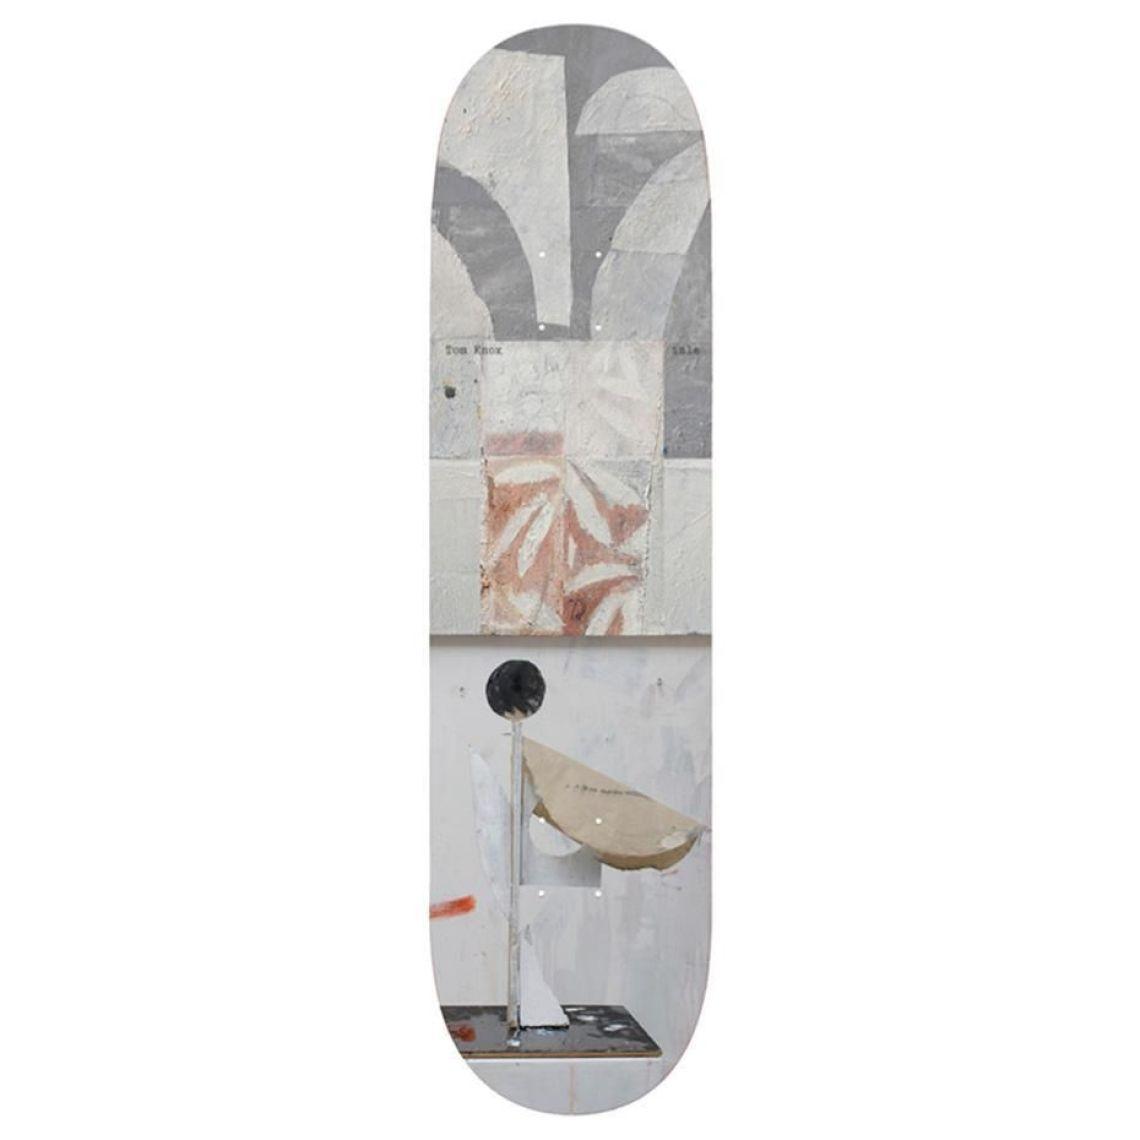 Sculpture Series By Nick Jensen X Isle Skateboards 8